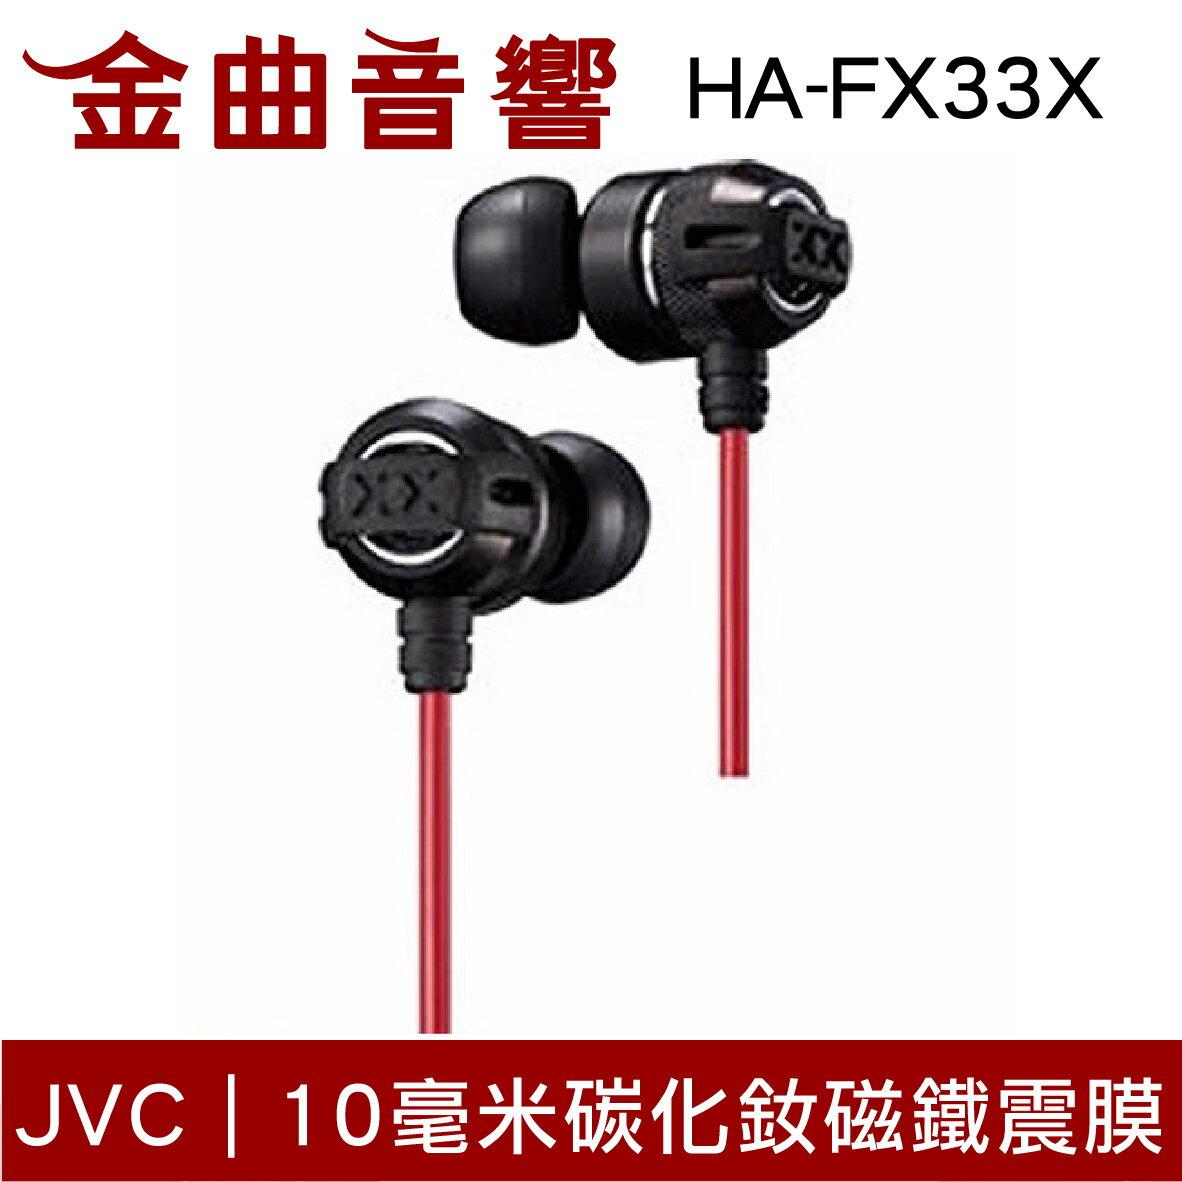 JVC 超重低音系列 HA-FX33X 噪音隔離 黑紅 耳道式耳機 | 金曲音響